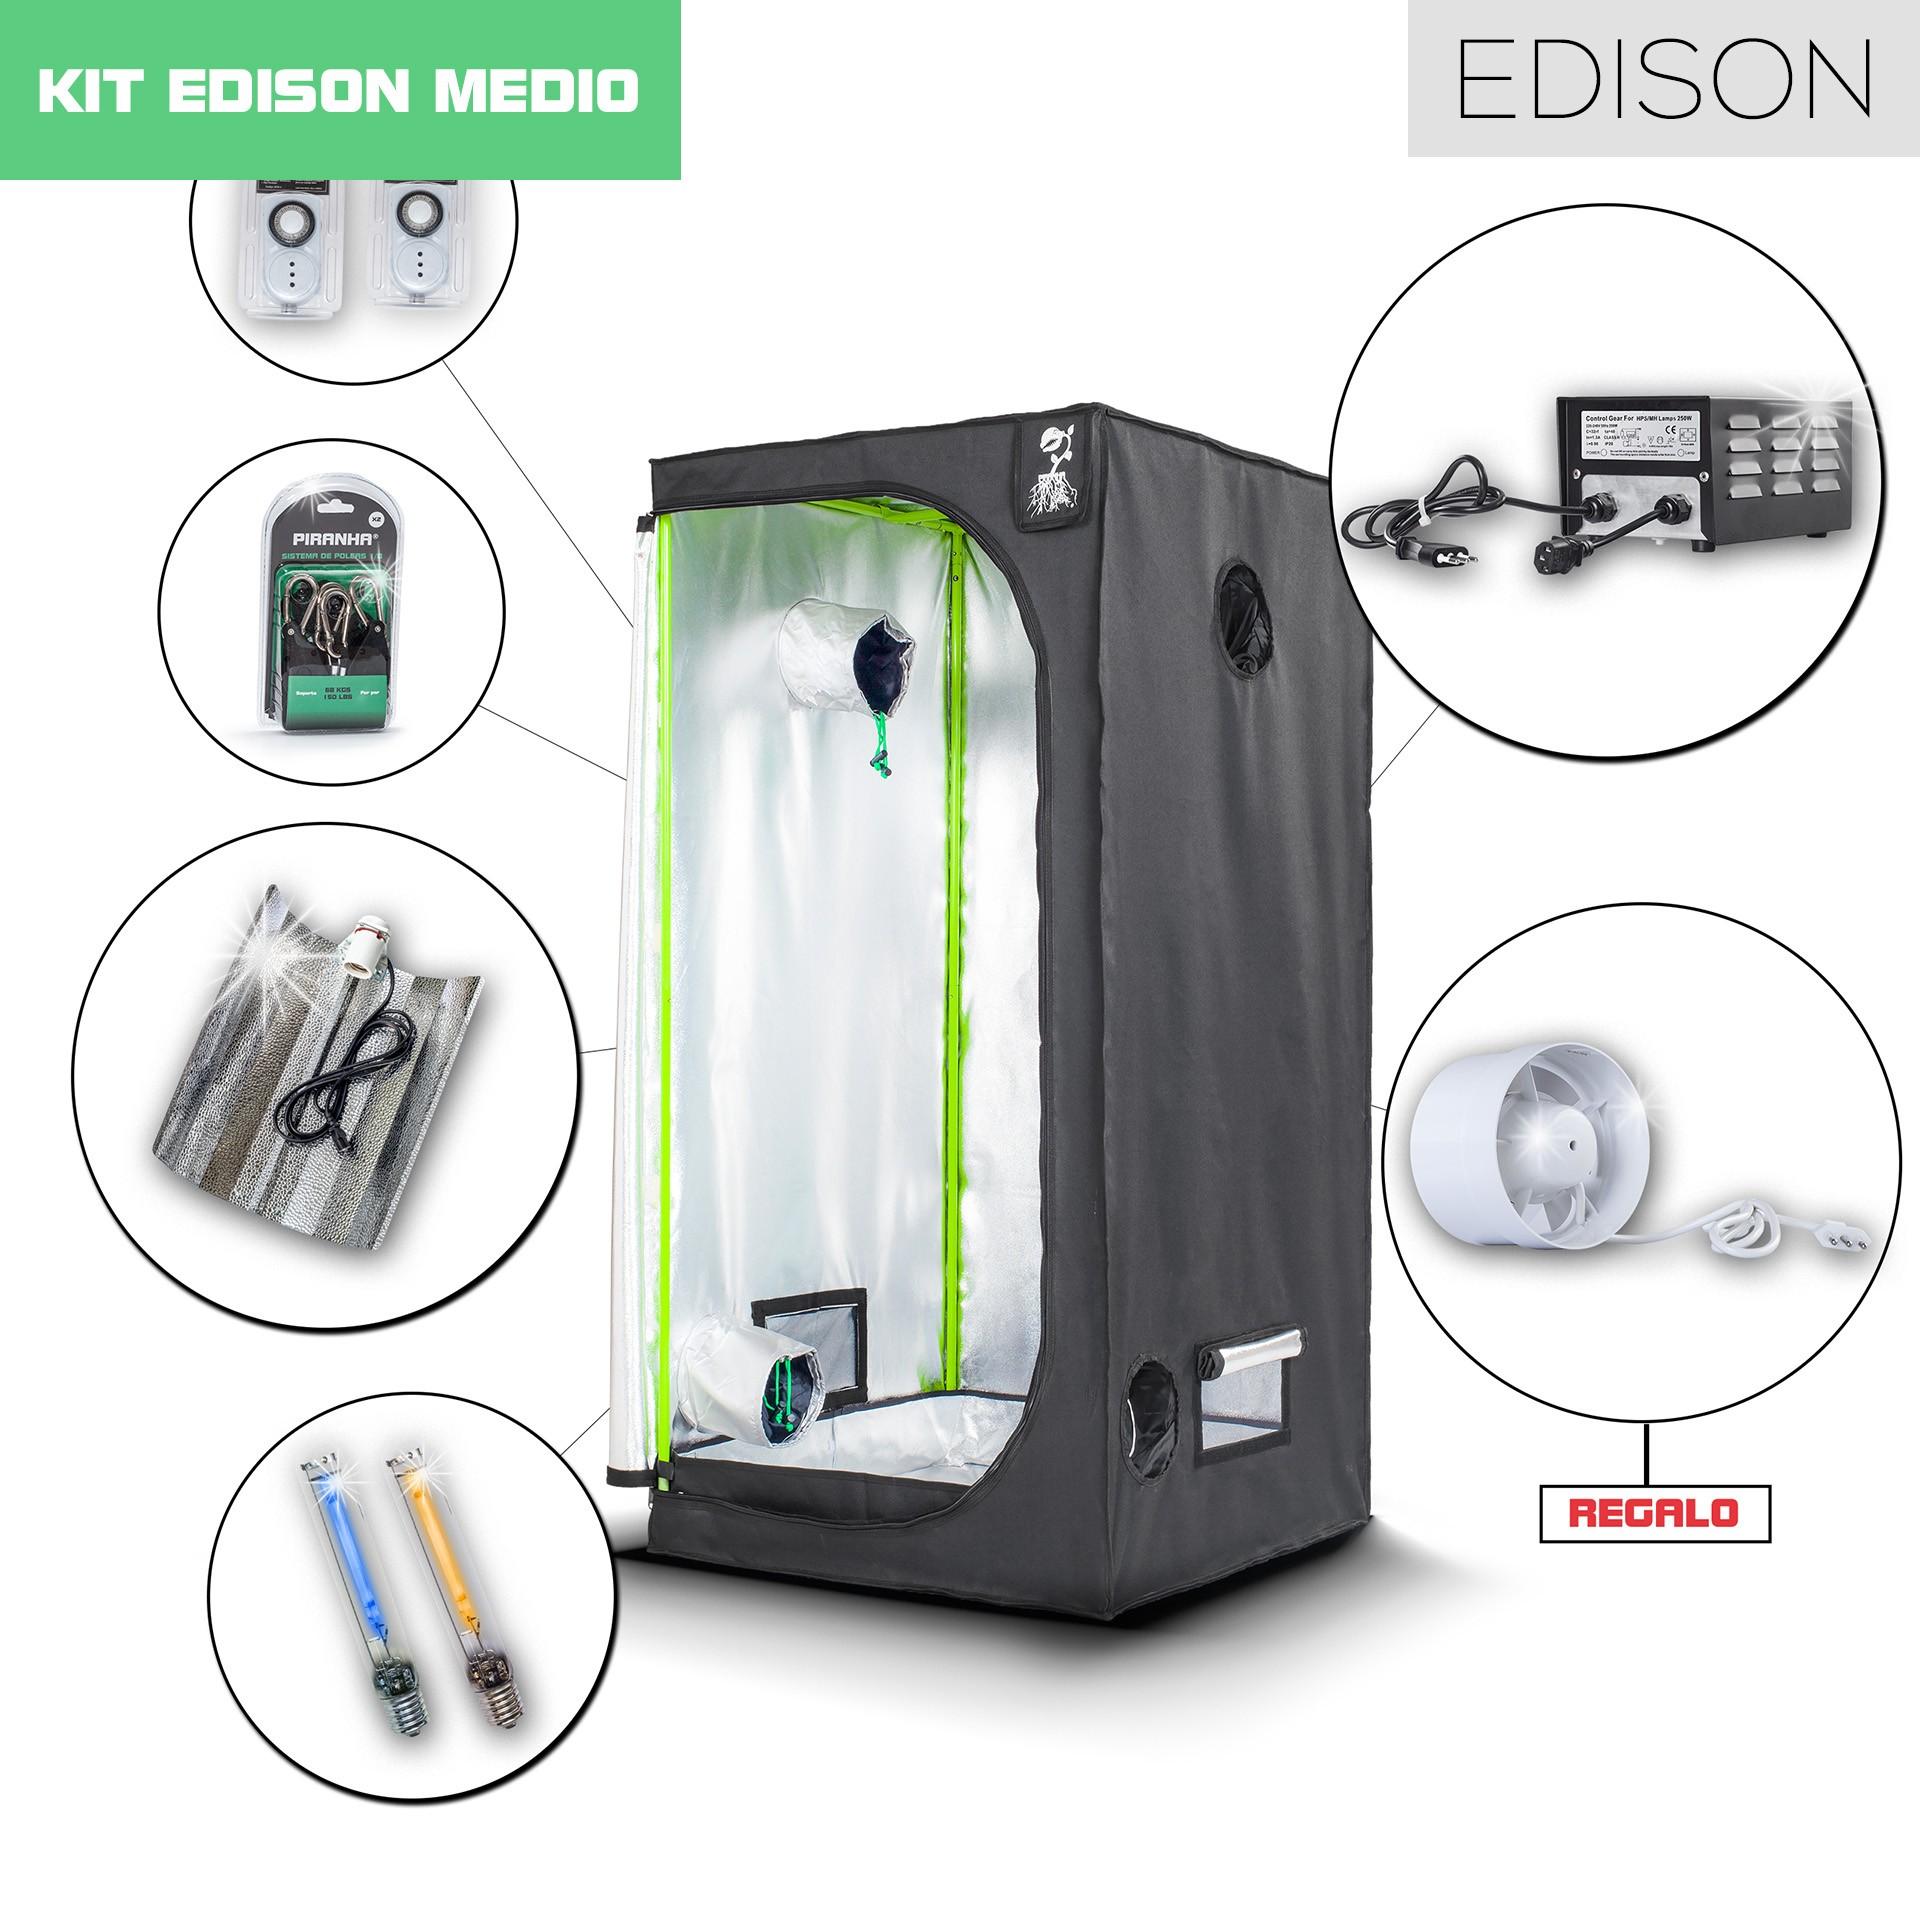 Kit Edison Pro 80 - 250W Medio